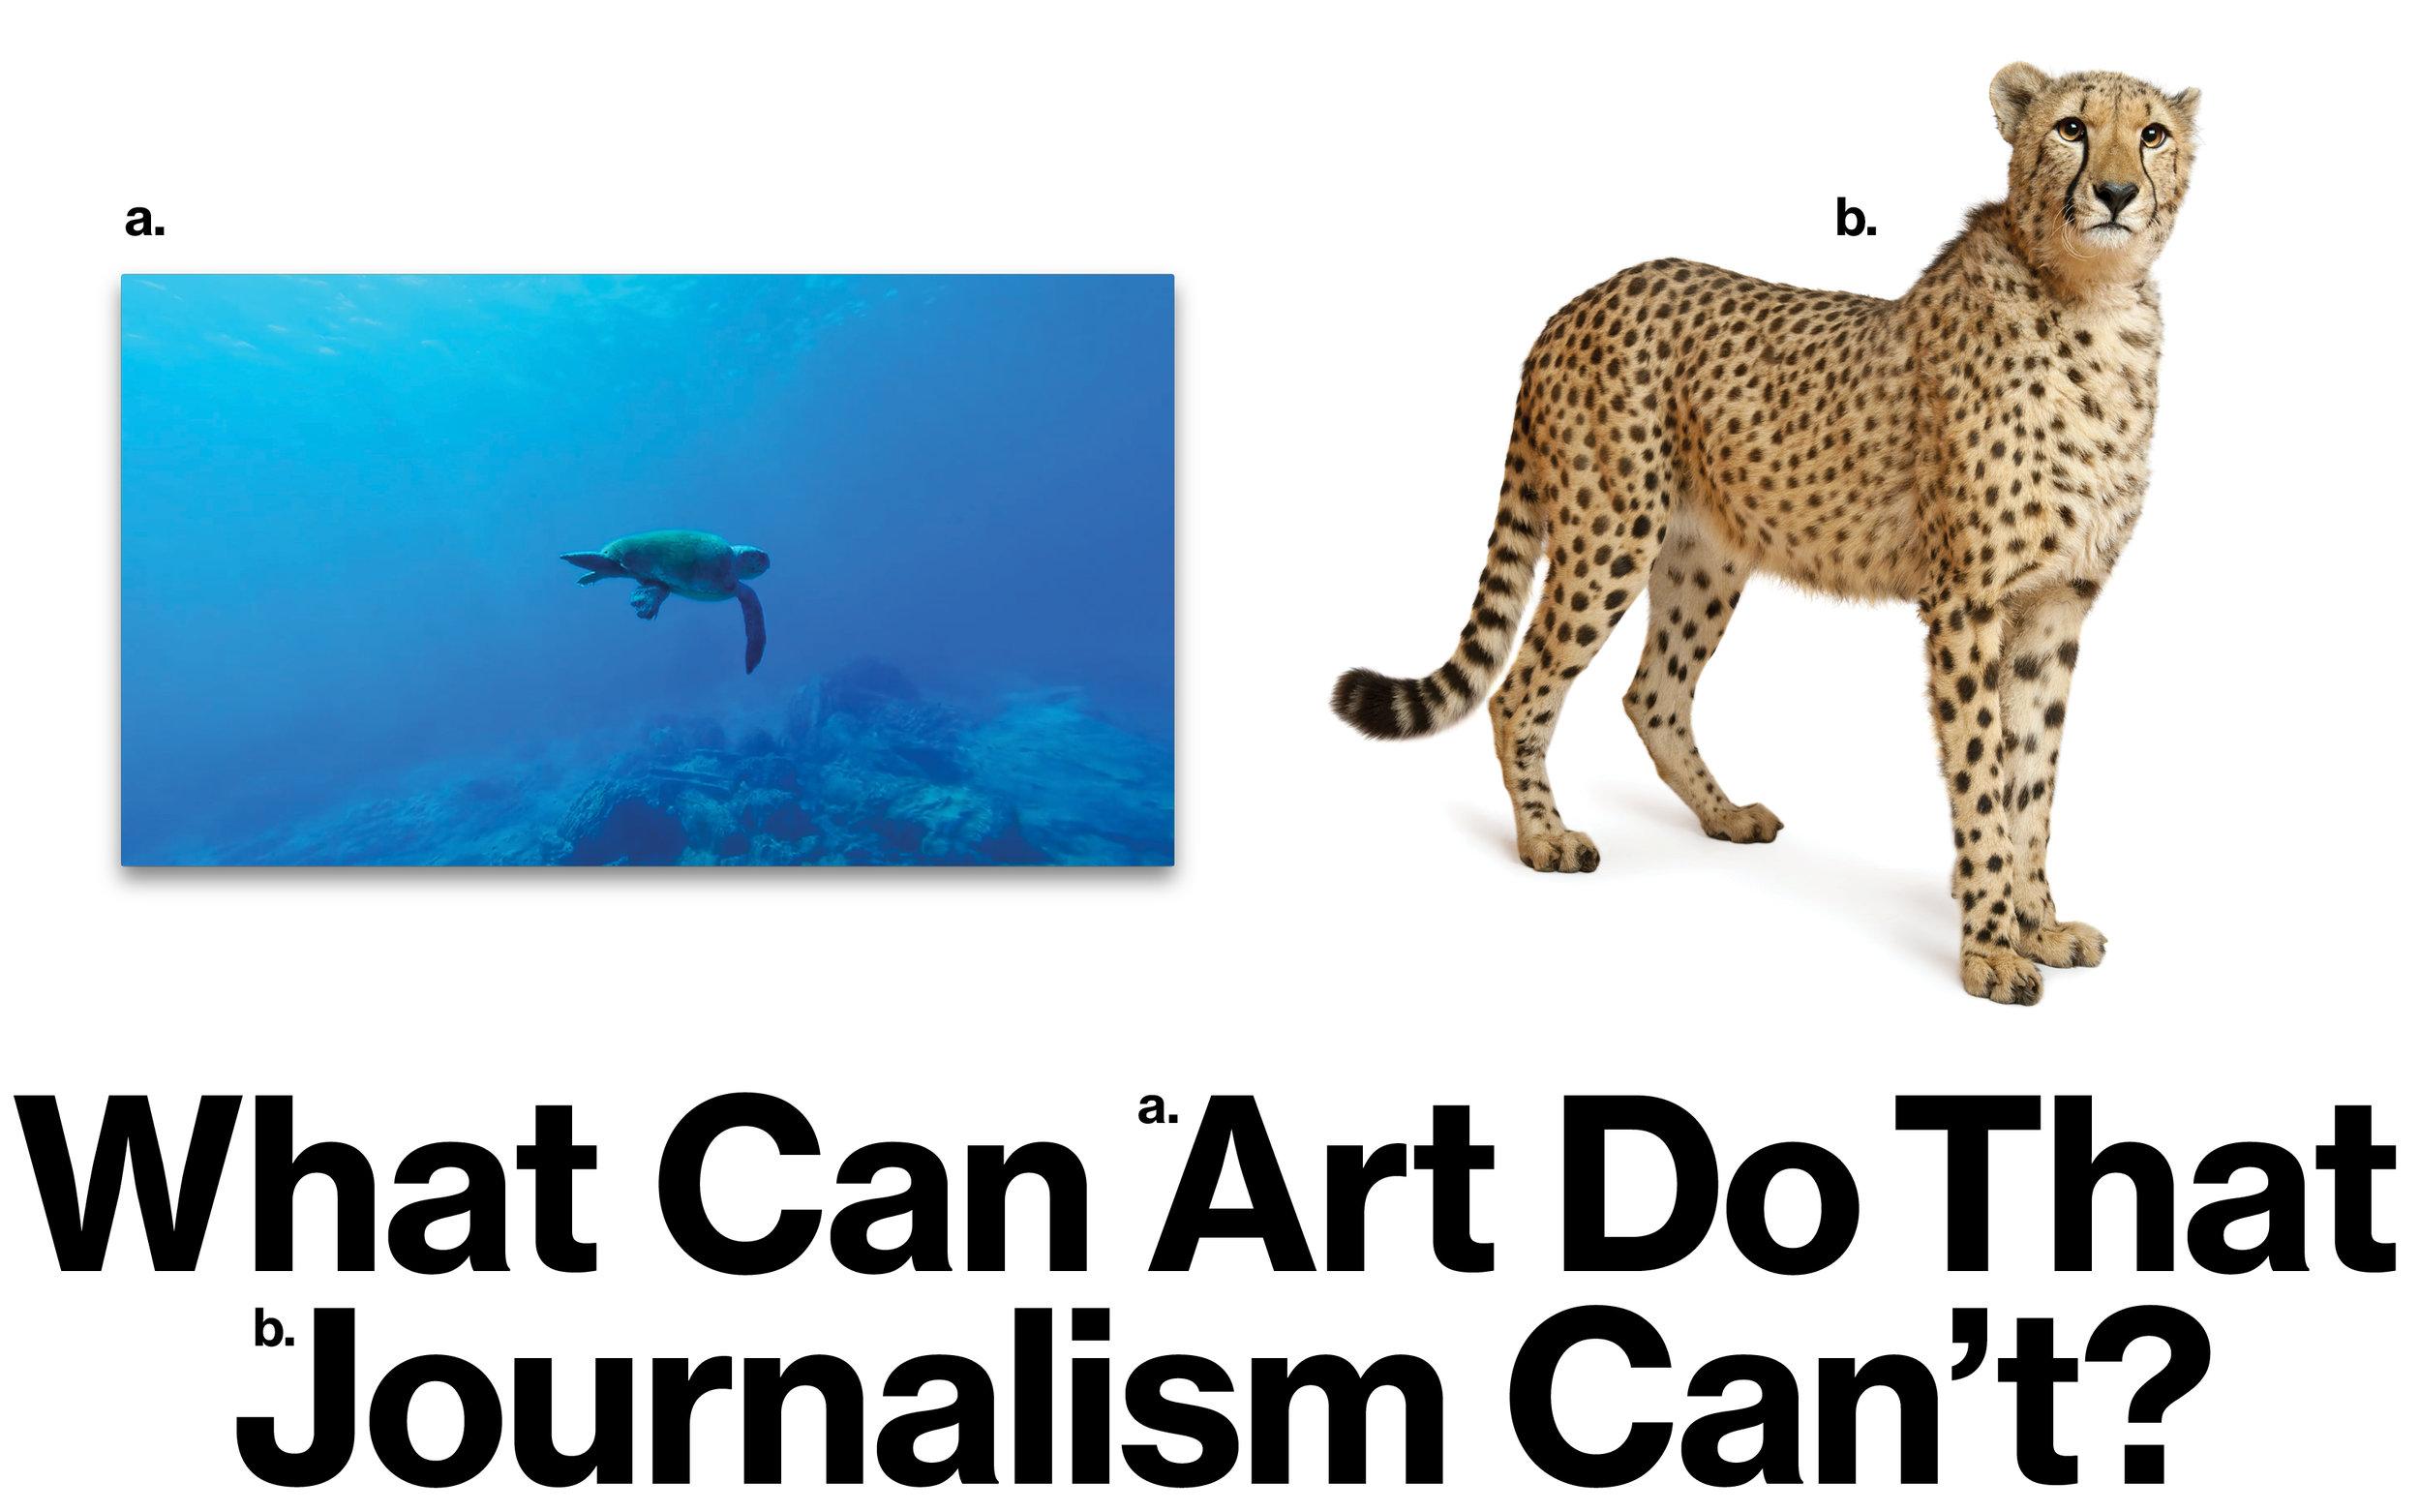 walker-journalism-art-16-10.jpg